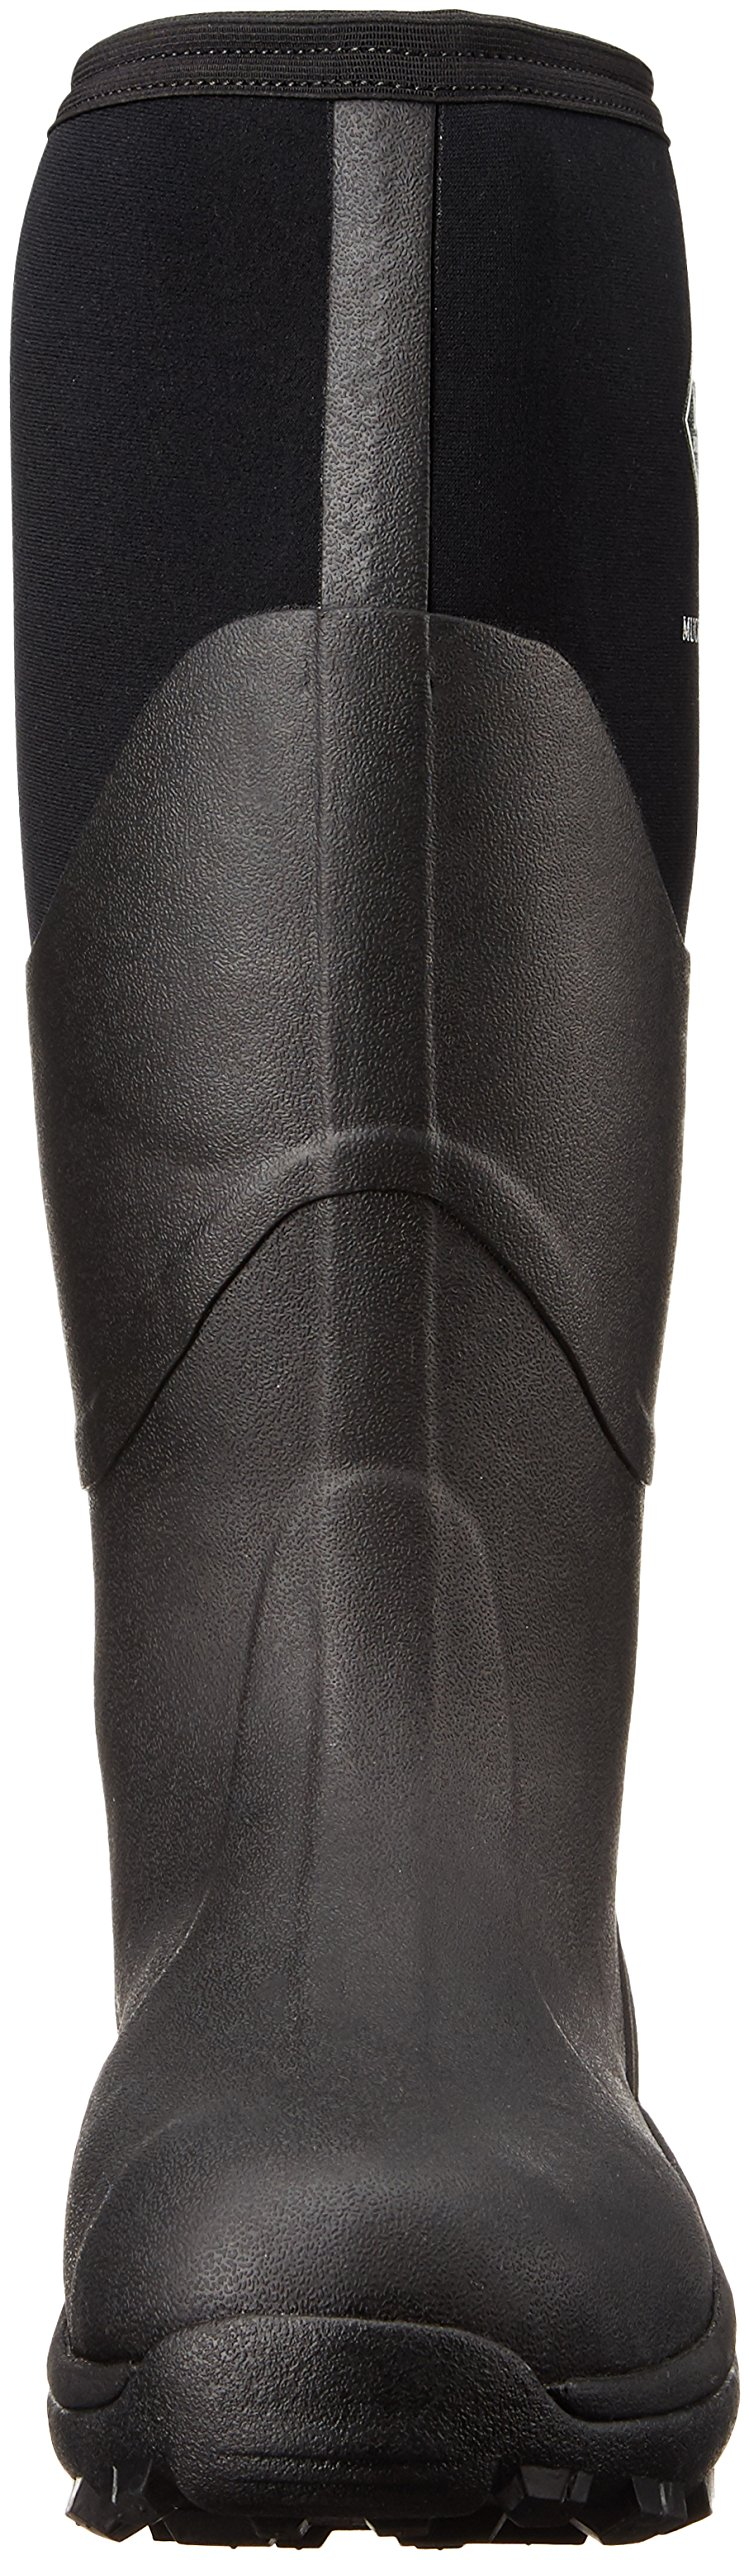 e4cfe74ec Muck Boot Adult MuckMaster Hi-Cut Boot - MMH-500A < Safety Boots ...